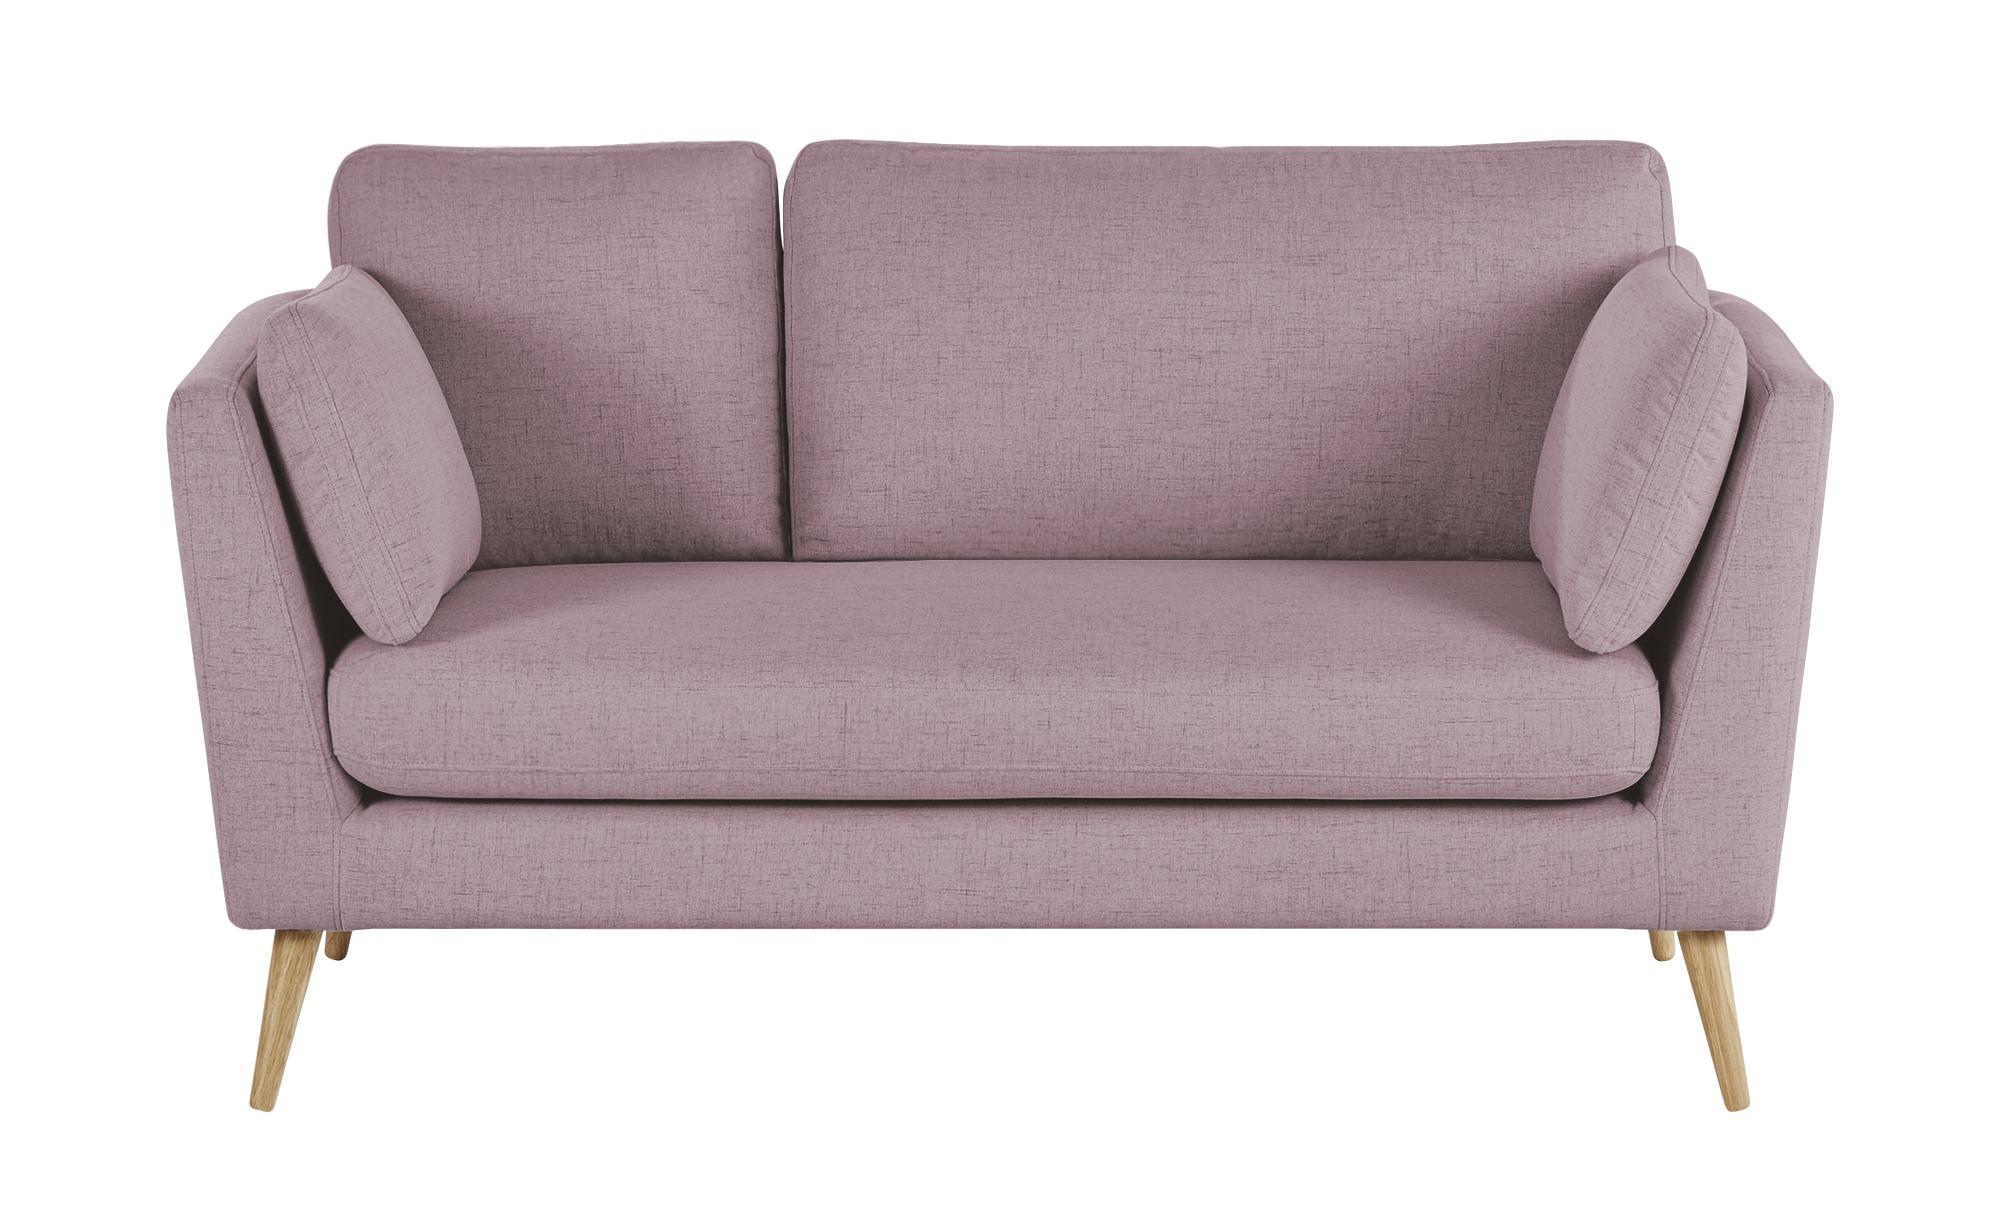 finya Skandi-Sofa altrosa - Webstoff Jane ¦ rosa/pink ¦ Maße (cm): B: 162 H: 92 T: 88 Polstermöbel > Sofas > 2-Sitzer - Höffner